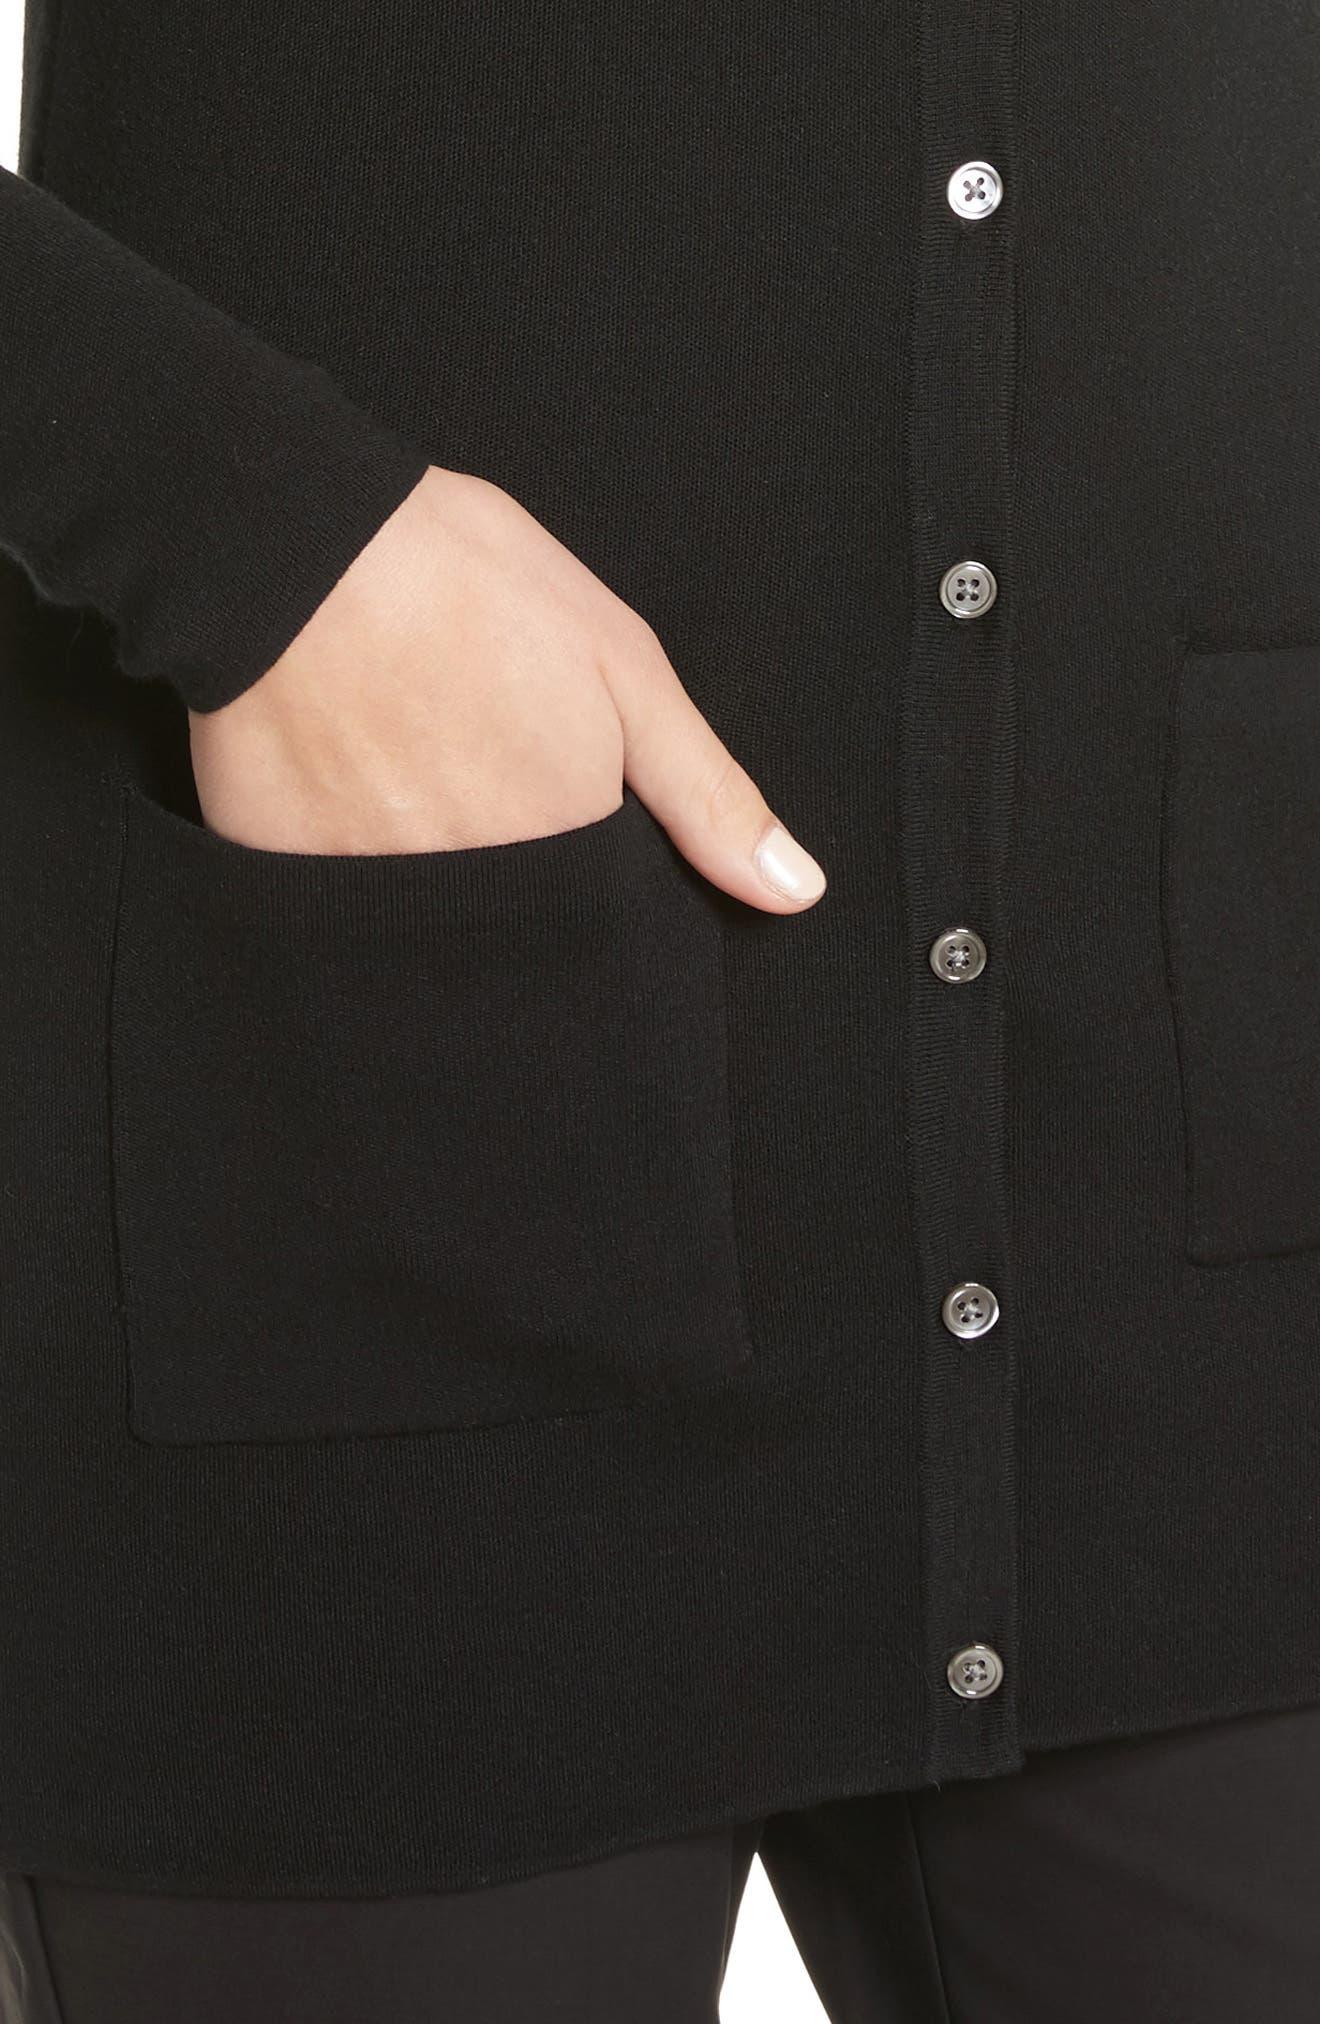 Cashmere Cardigan,                             Alternate thumbnail 4, color,                             Black